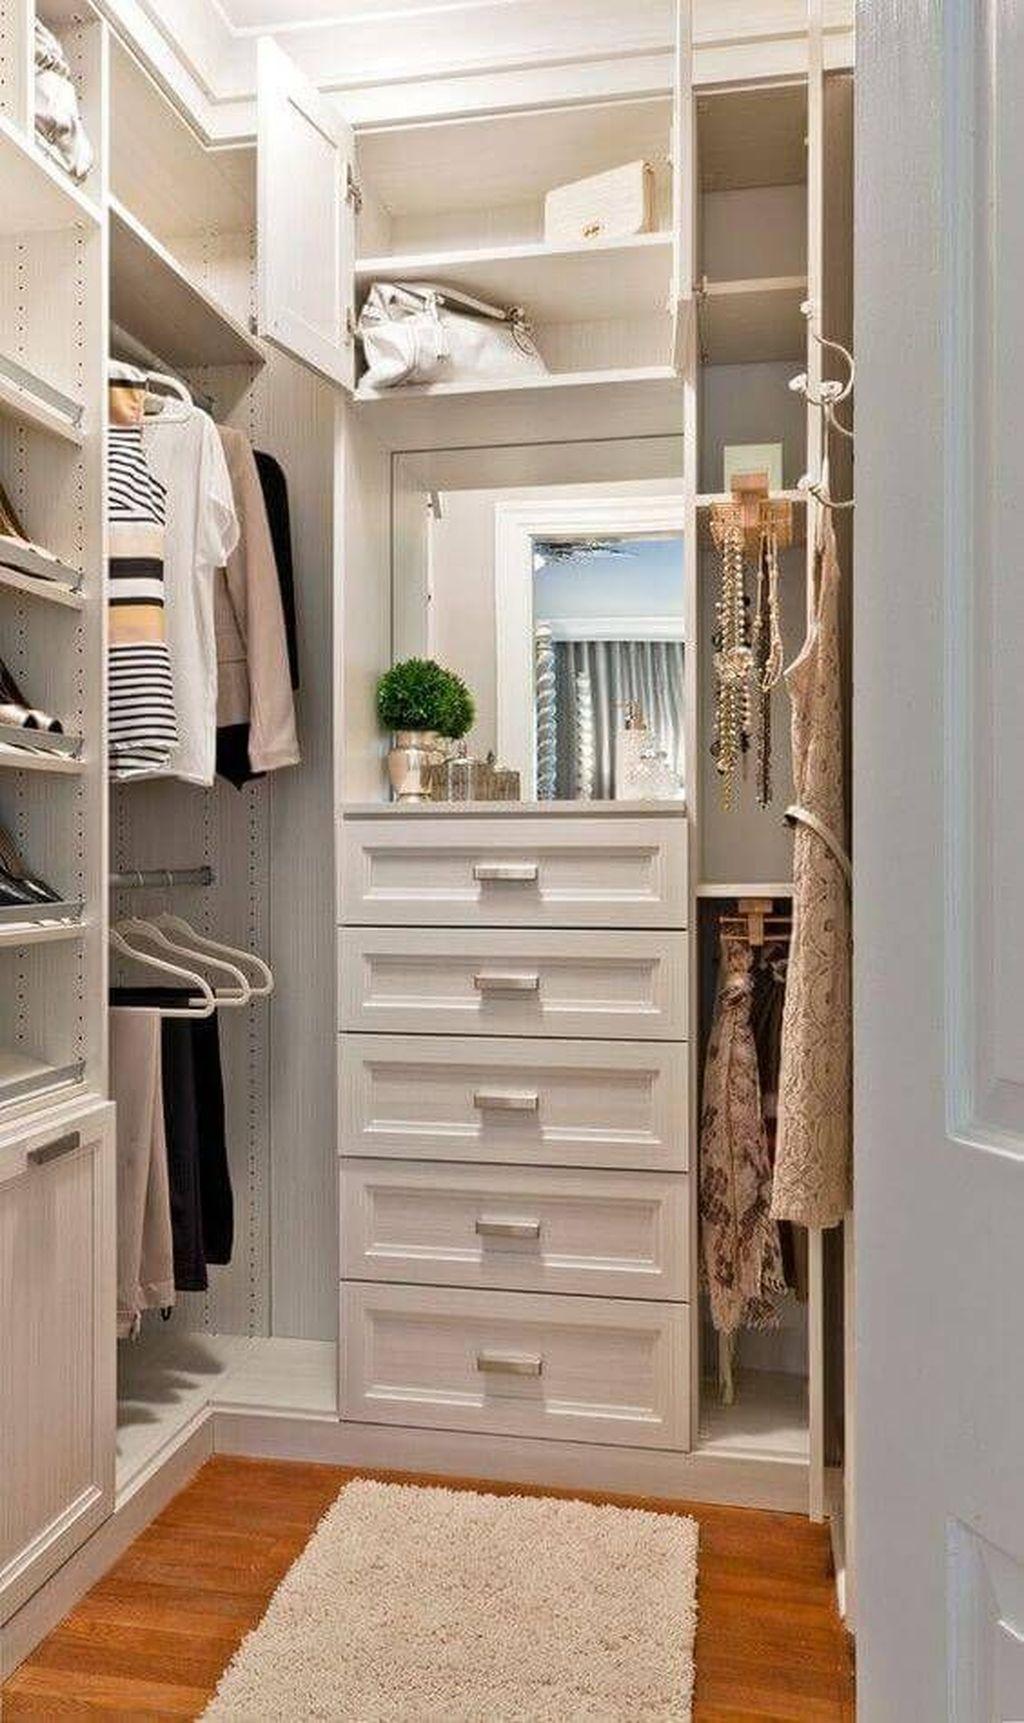 Rustic Wardrobe Design Ideas That Is In Trend 05